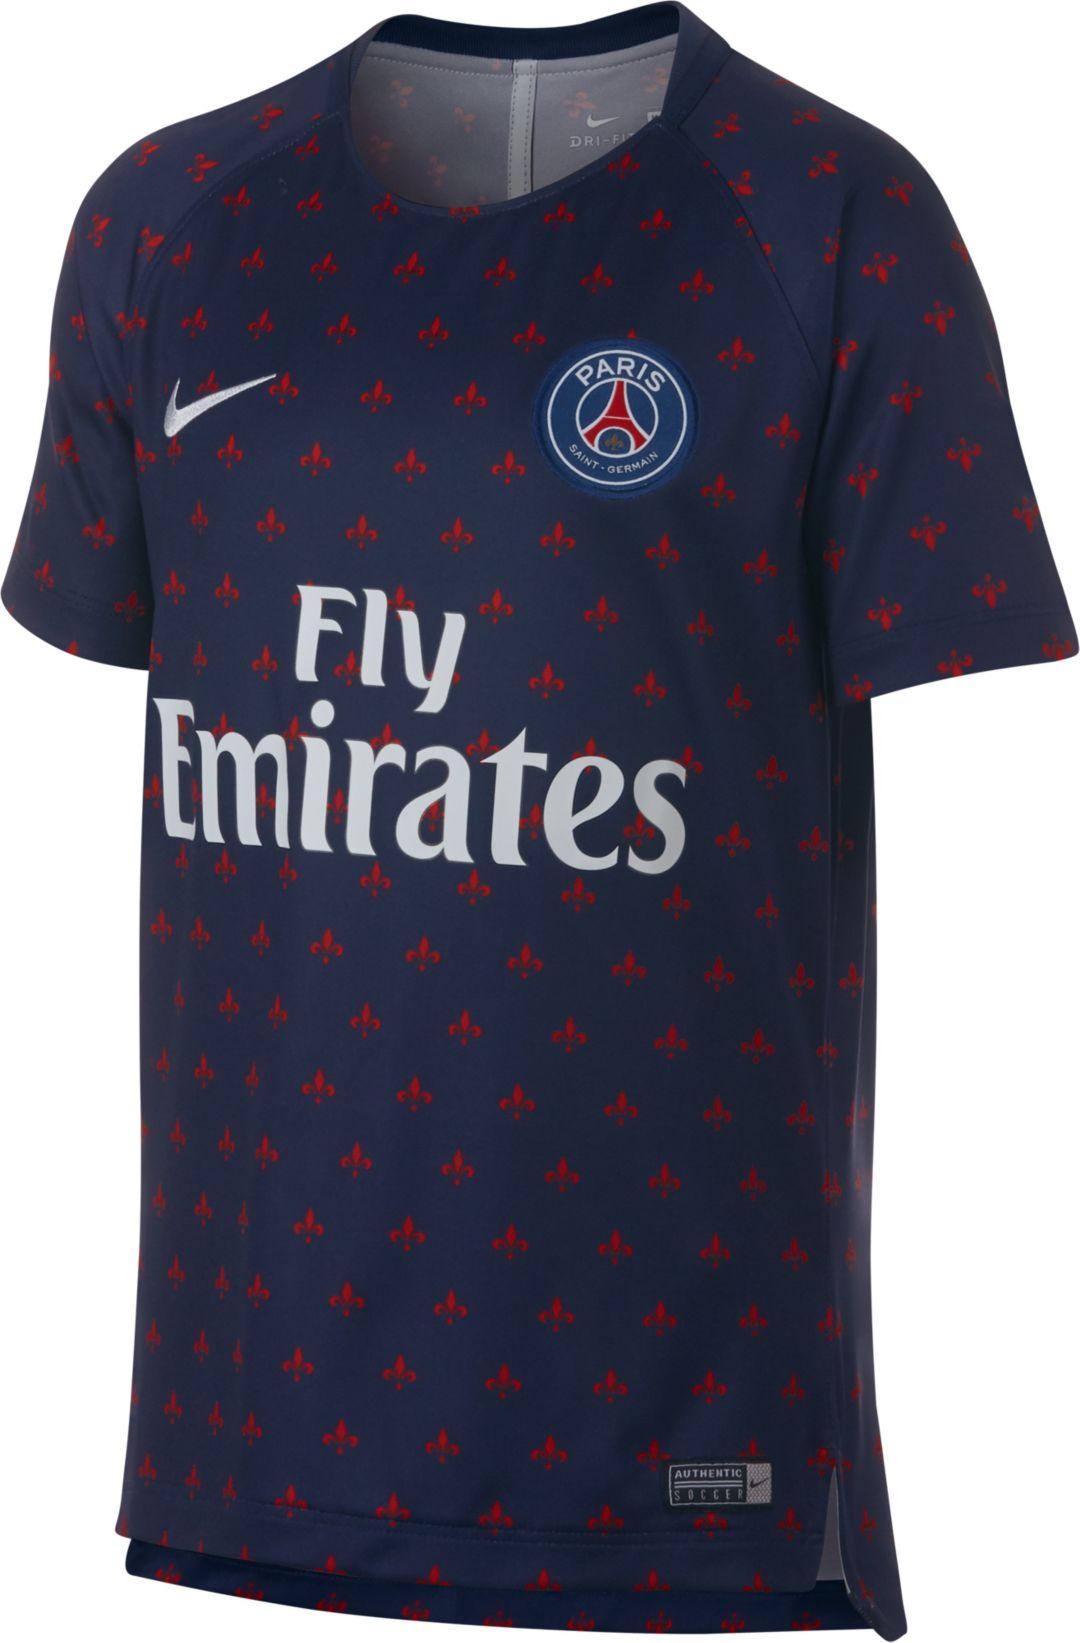 dea1631ec3f Nike Youth Paris Saint-Germain Navy Prematch Top 1